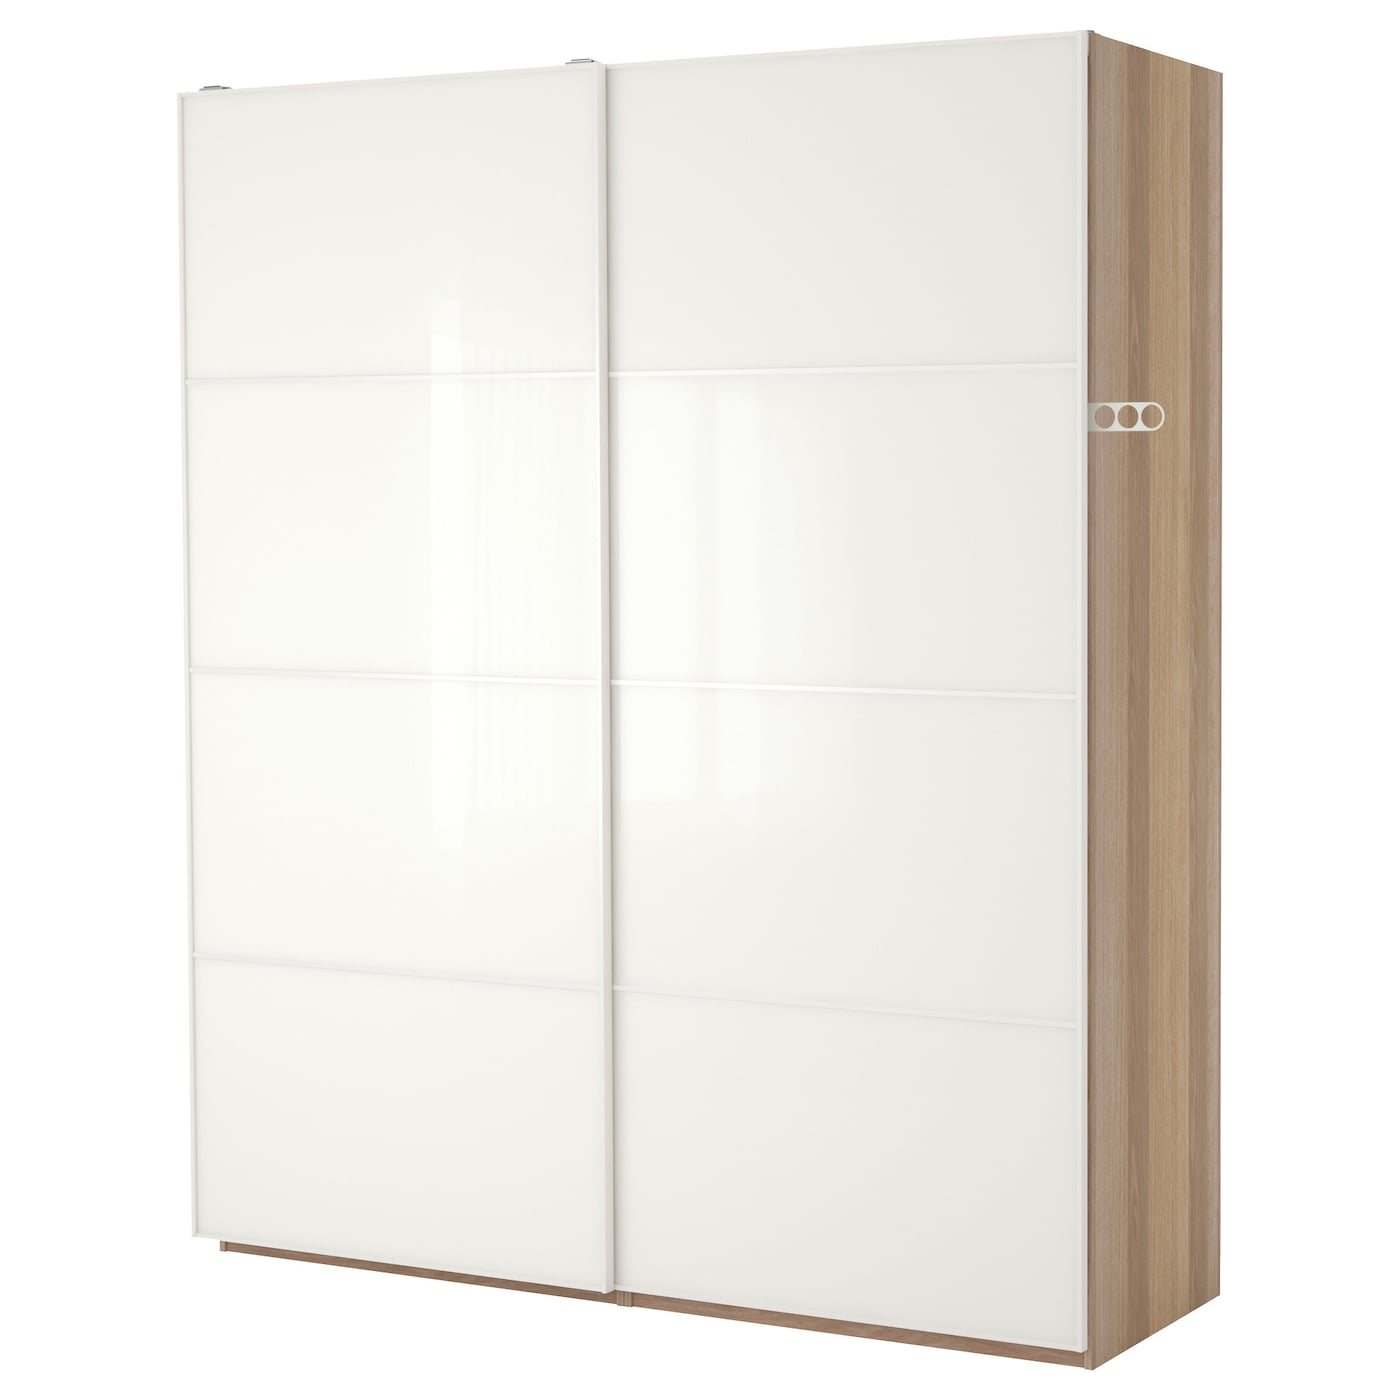 pax armoire penderie effet ch ne blanchi f rvik verre blanc 200 x 66 x 236 cm ikea. Black Bedroom Furniture Sets. Home Design Ideas